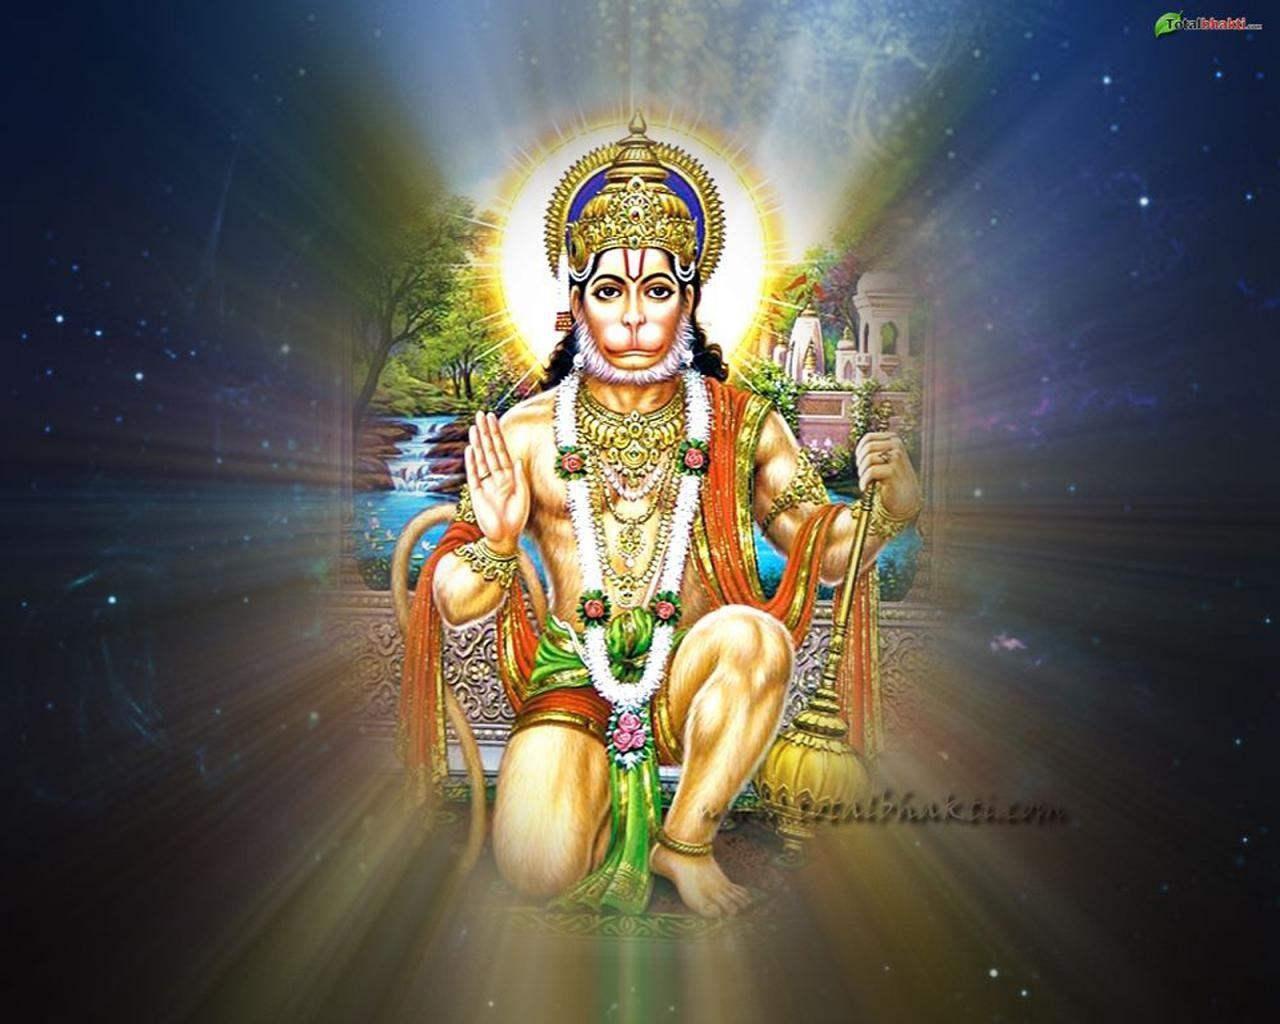 Lord Hanuman Wallpapers Hd 3d Wallpaper Cave Hanuman Hd Wallpaper Gods Wallpapers Hd Lord Hanuman Wallpapers